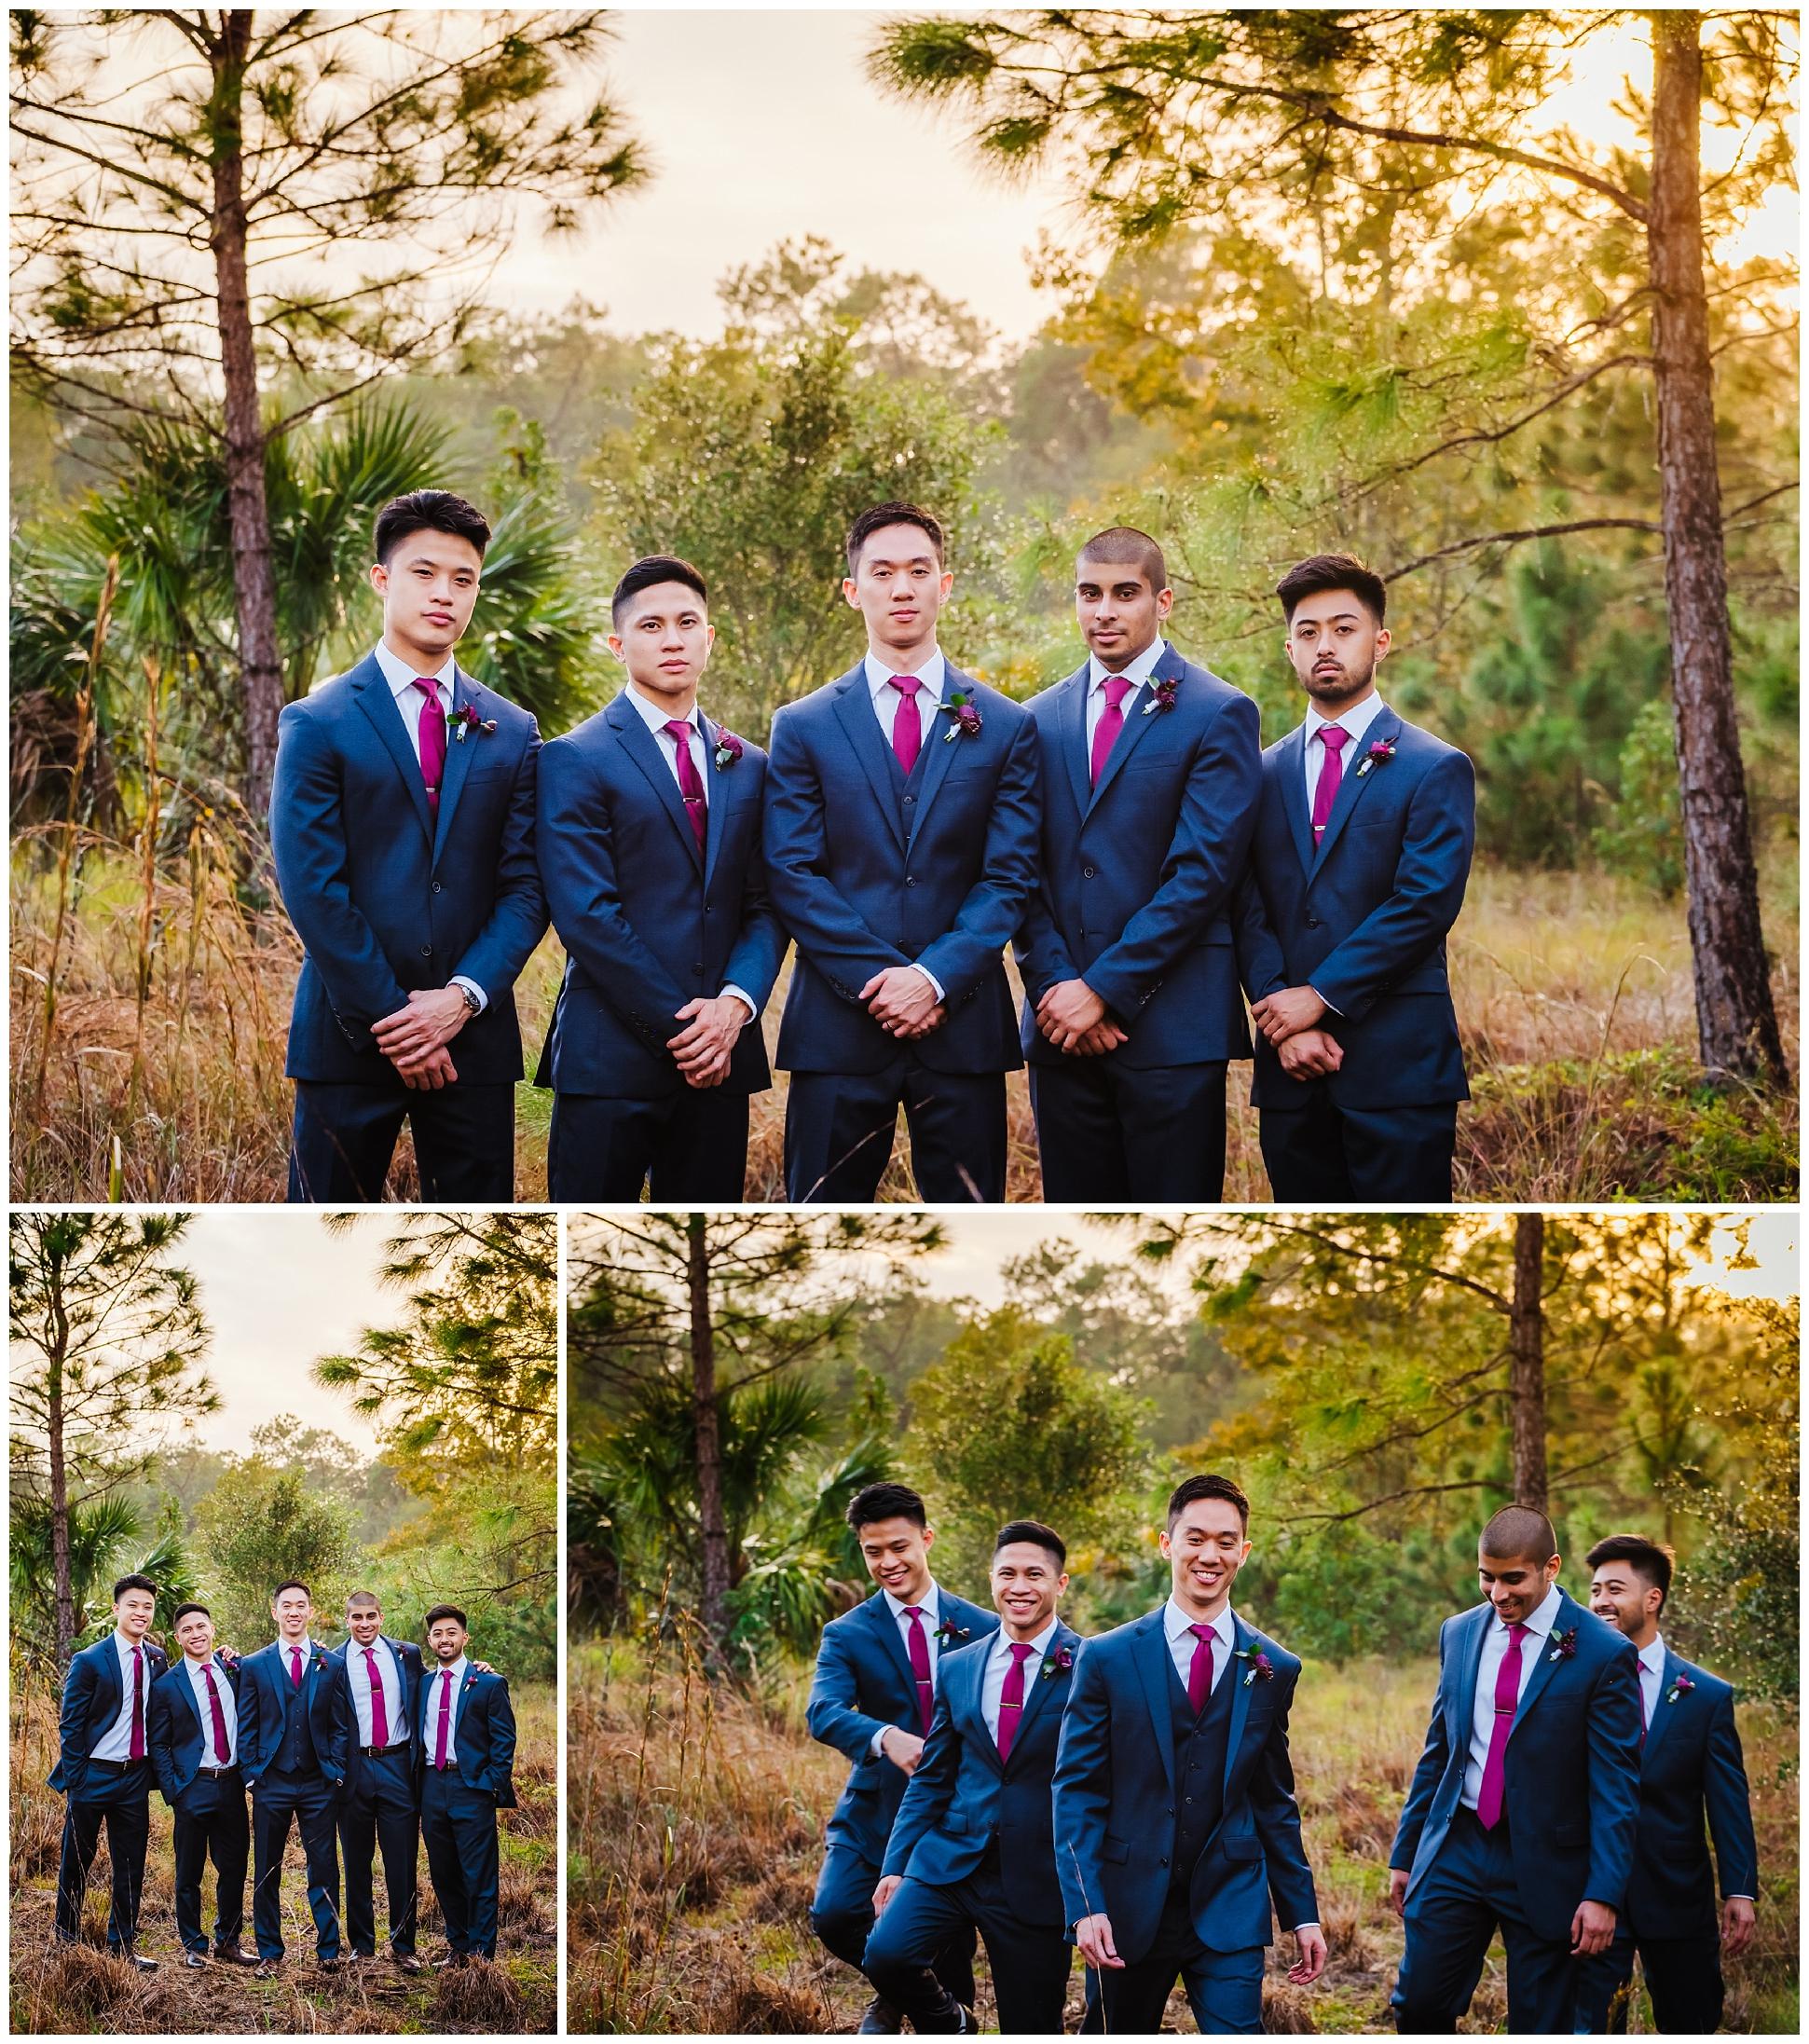 tampa-wedding-photographer-philipino-colorful-woods-ballroom-church-mass-confetti-fuscia_0051.jpg